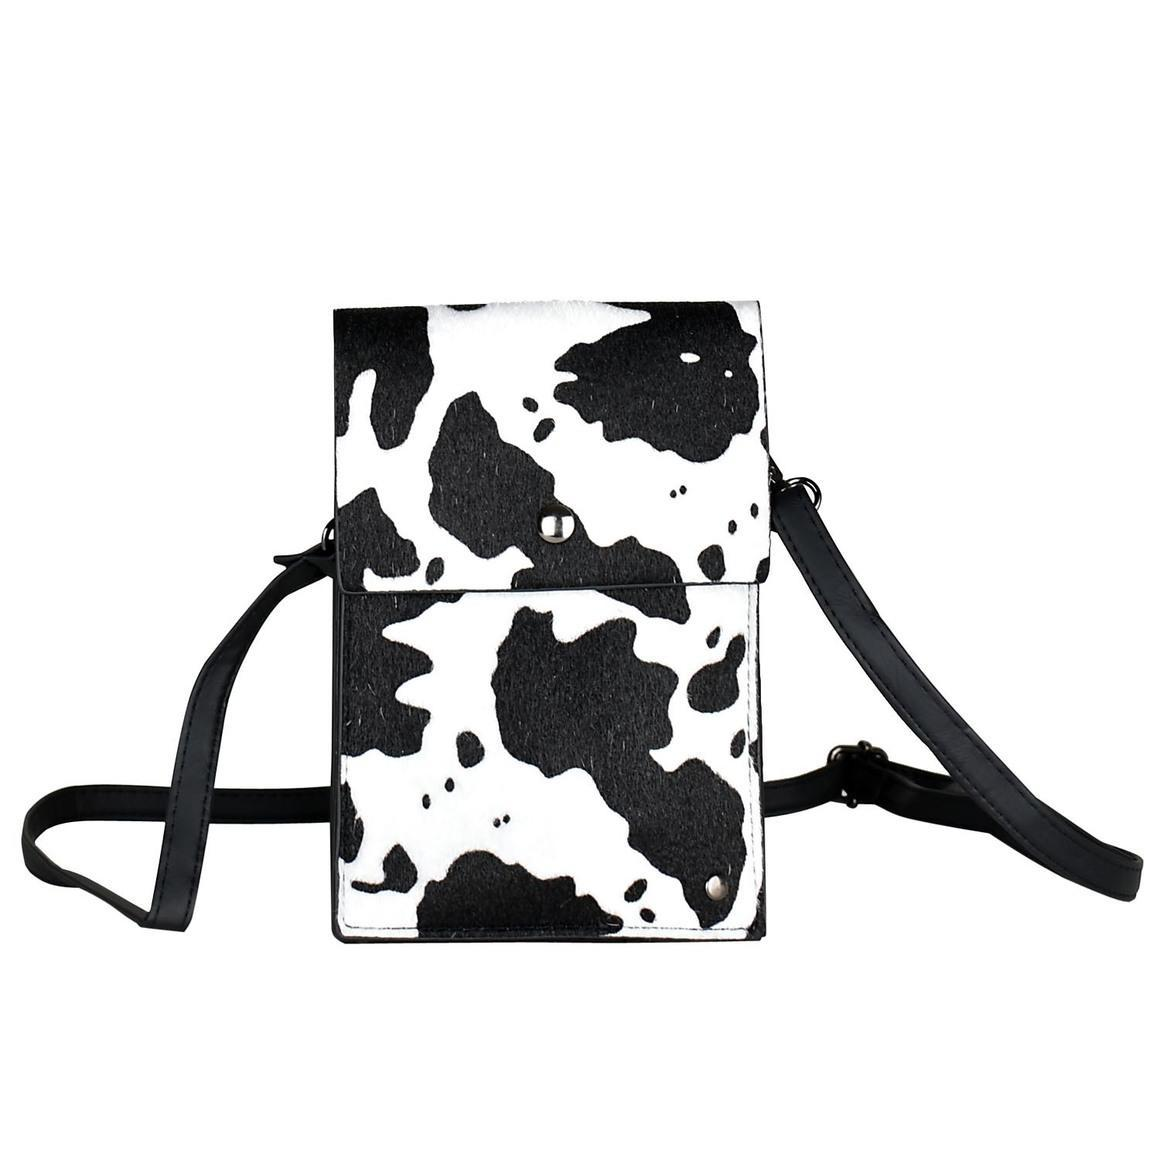 THSB1008: White: Animal Print Cross Bag | Trada Marketplace